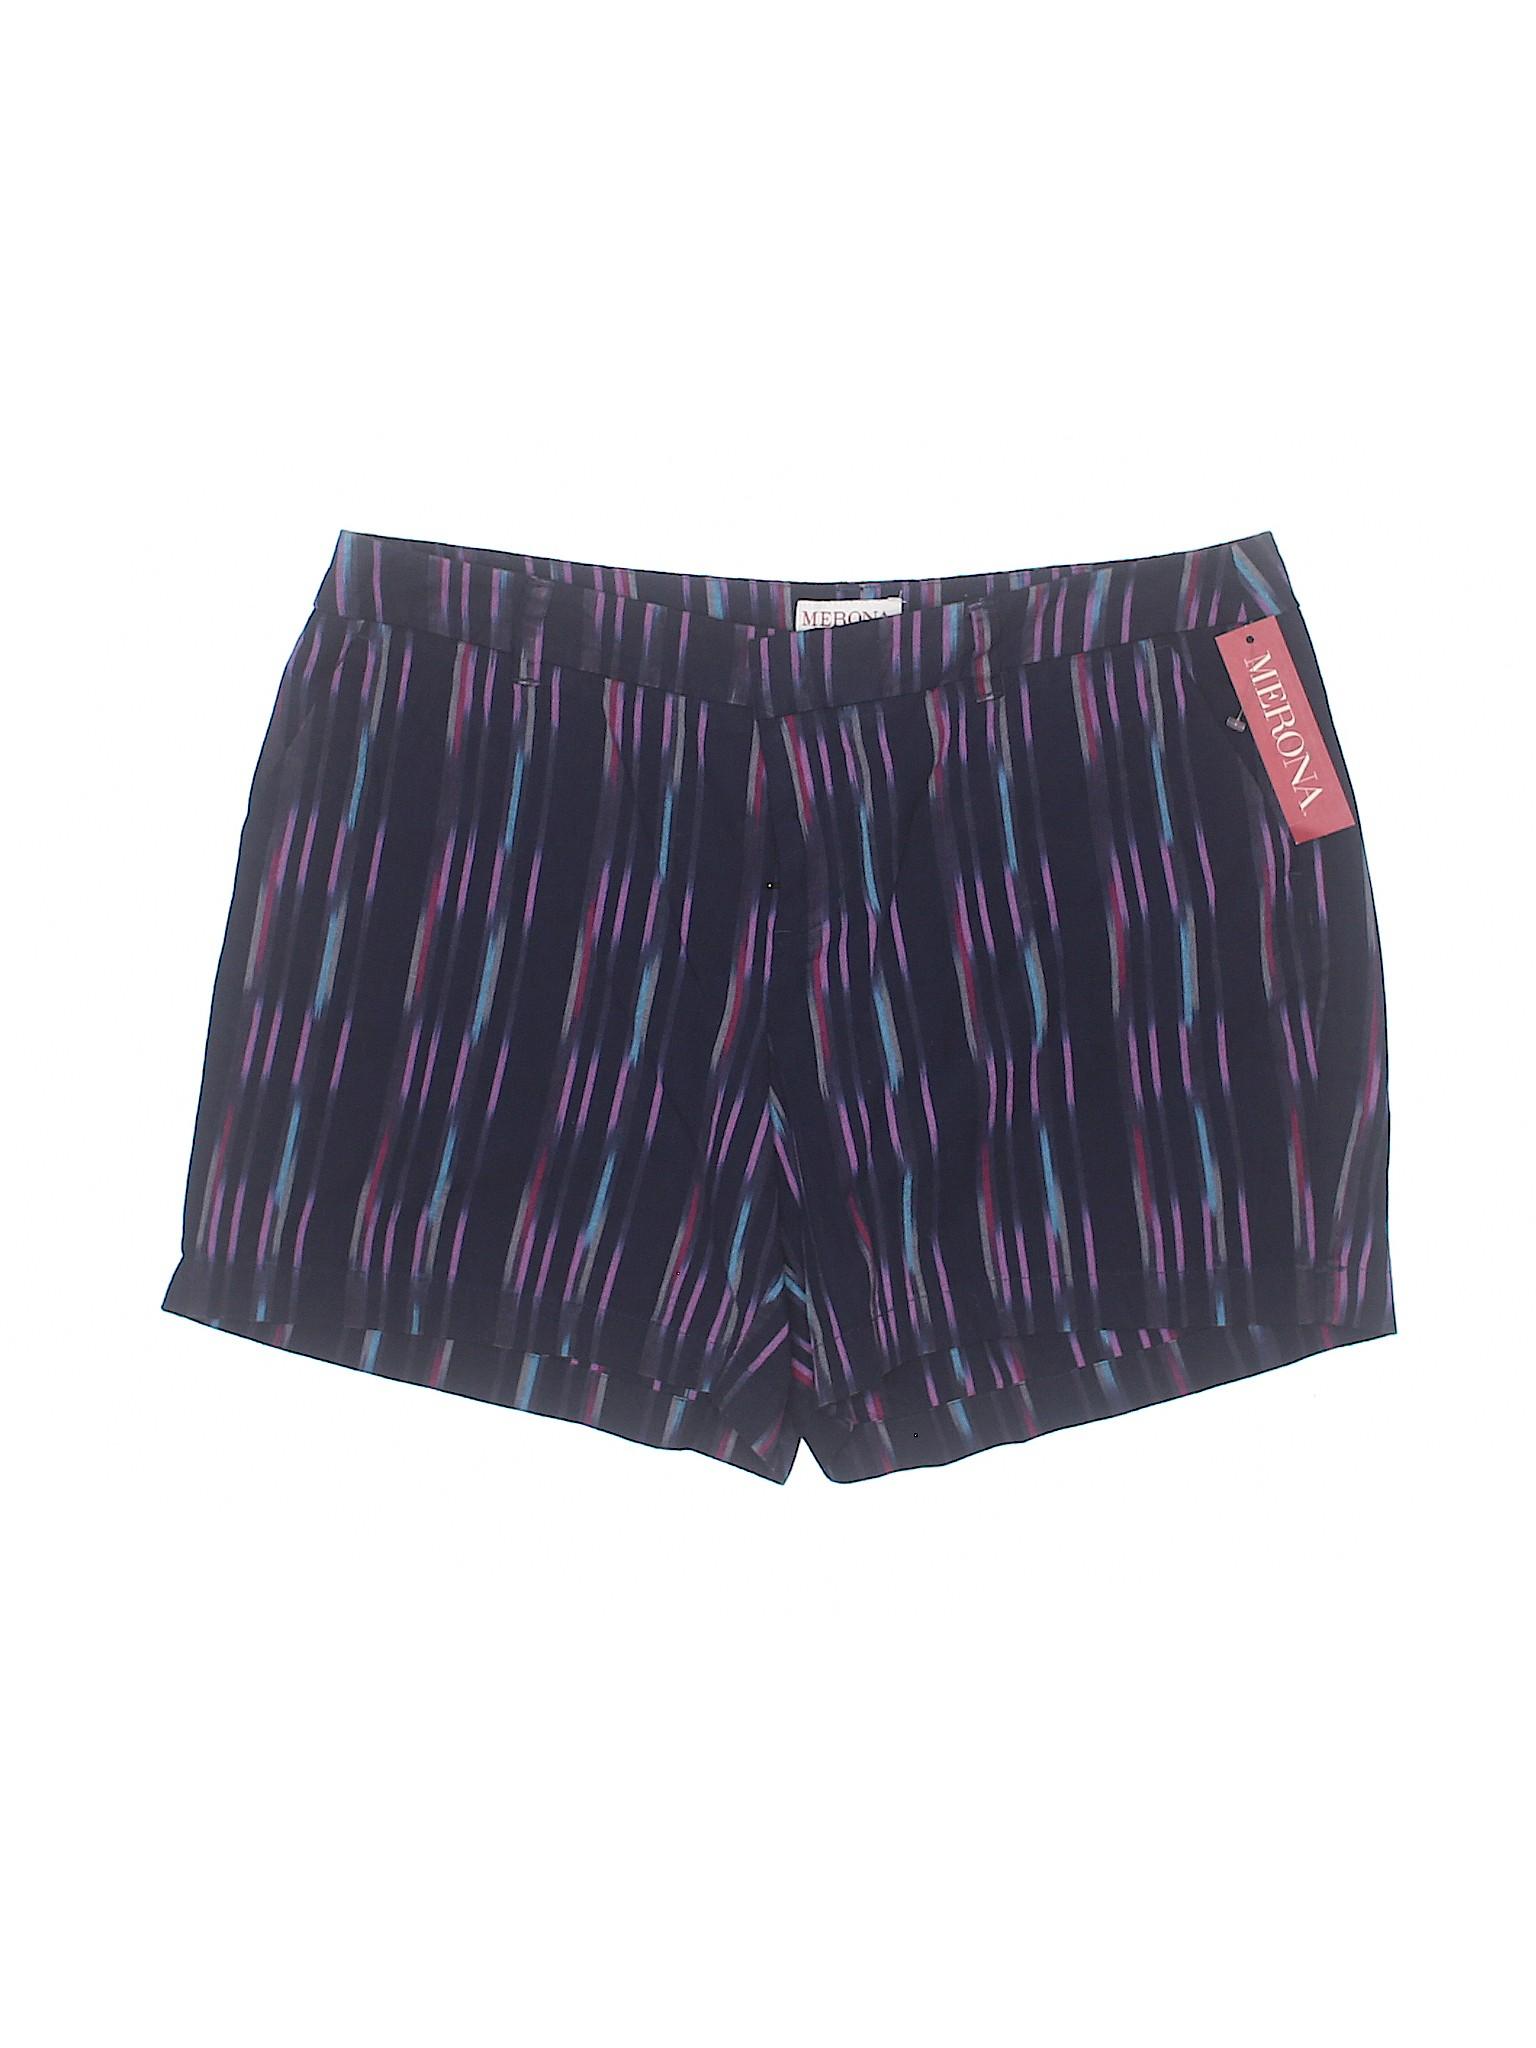 Boutique Merona Khaki Shorts Merona Boutique Boutique Shorts Khaki Merona Khaki Shorts FrFYq